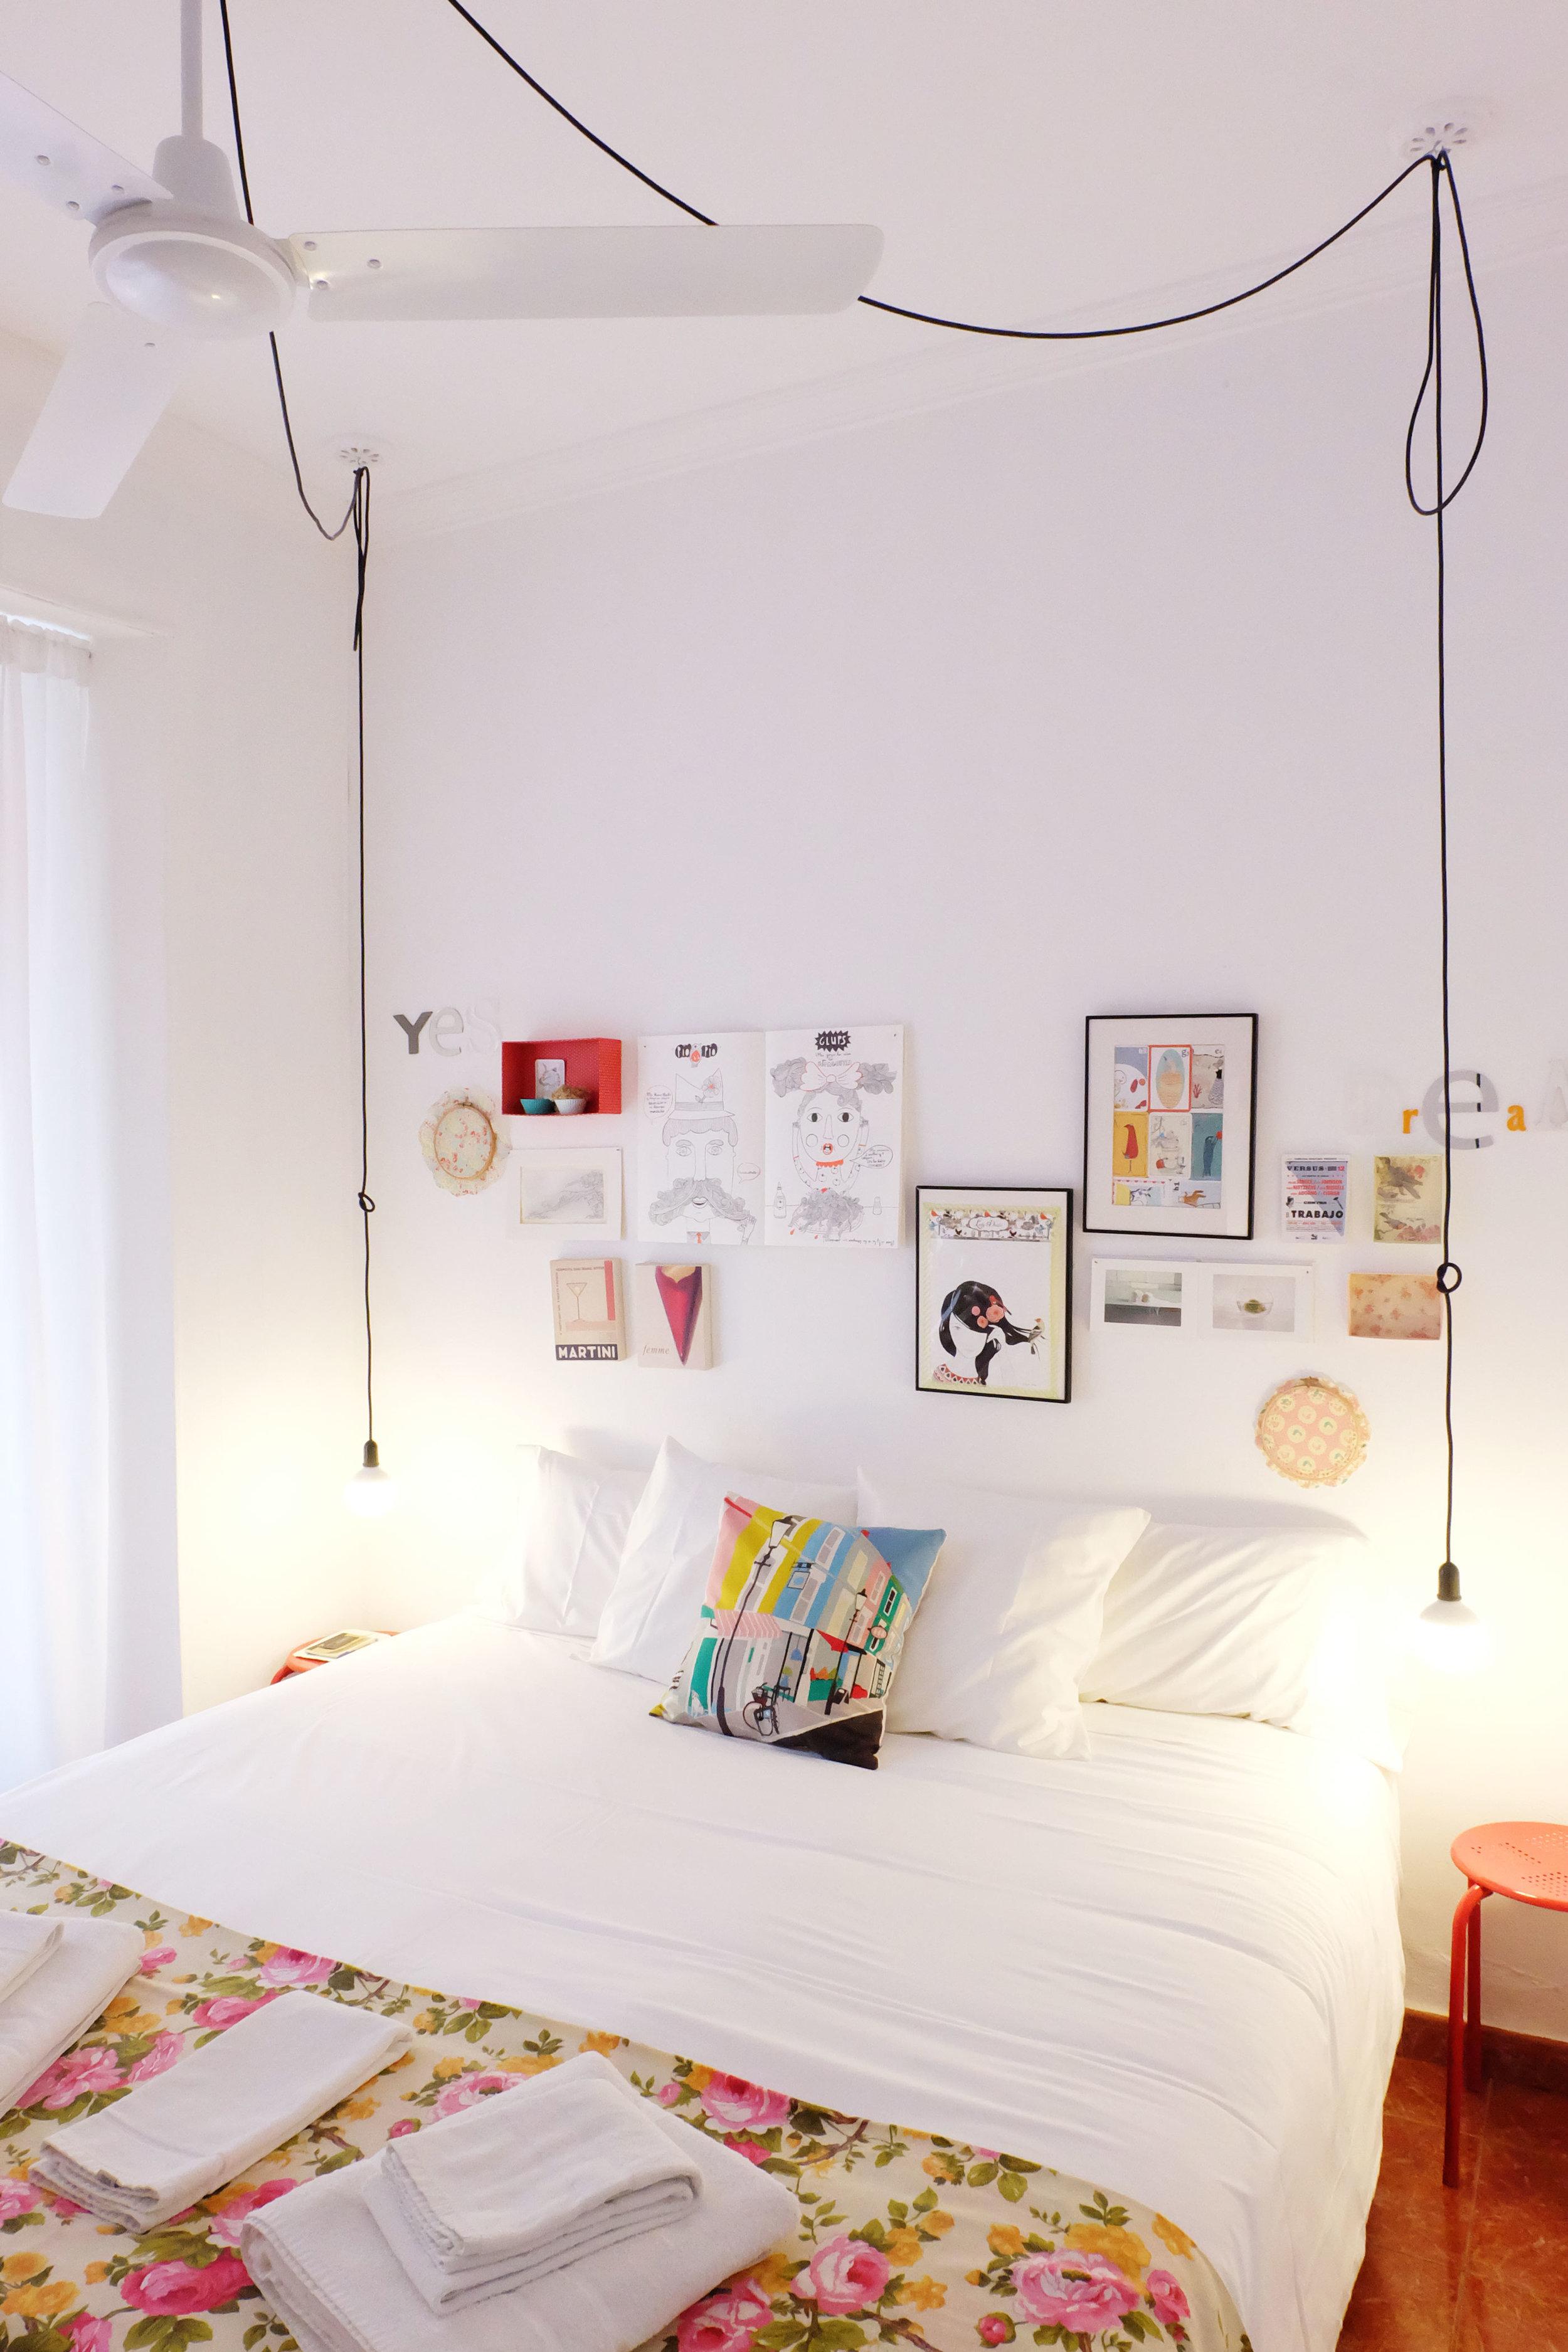 Hotel-Casa-de-Huespedes-Santa-Maria-Habitacion-4-4.jpg